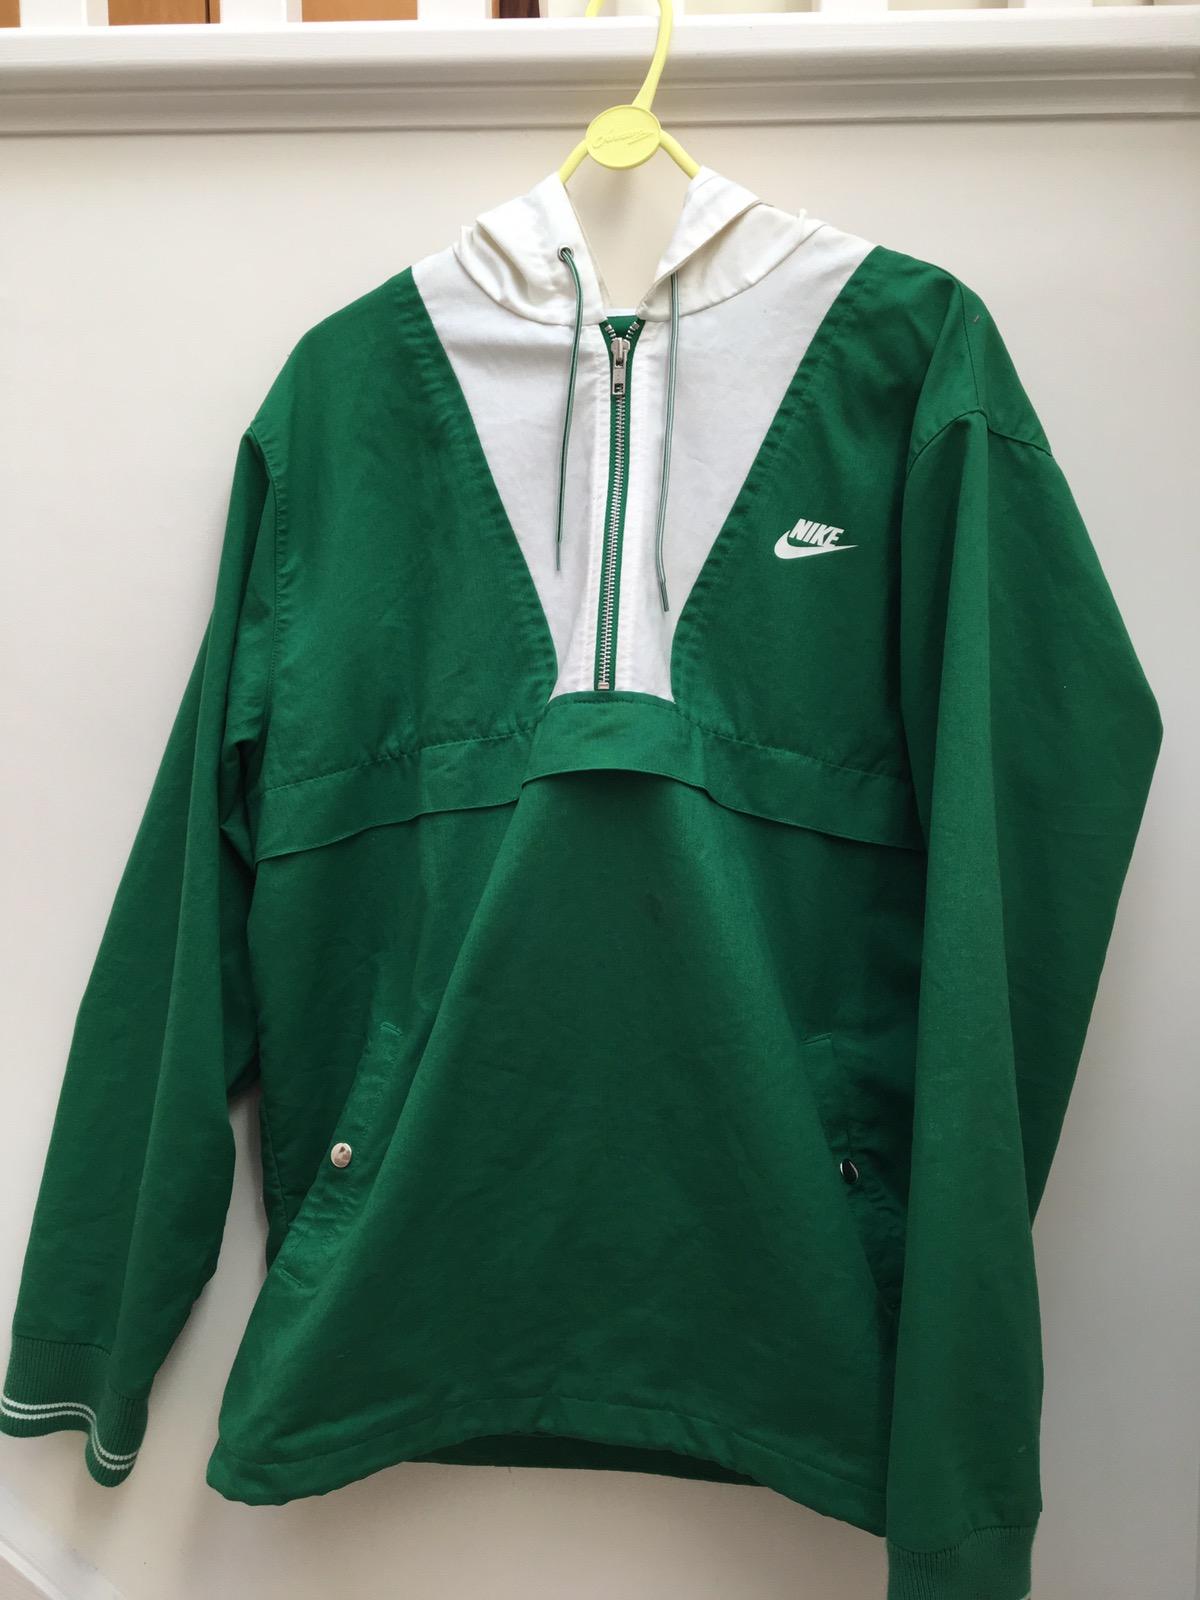 c9d853efebe2 Supreme Supreme Nike SB Pullover Size xl - Light Jackets for Sale - Grailed